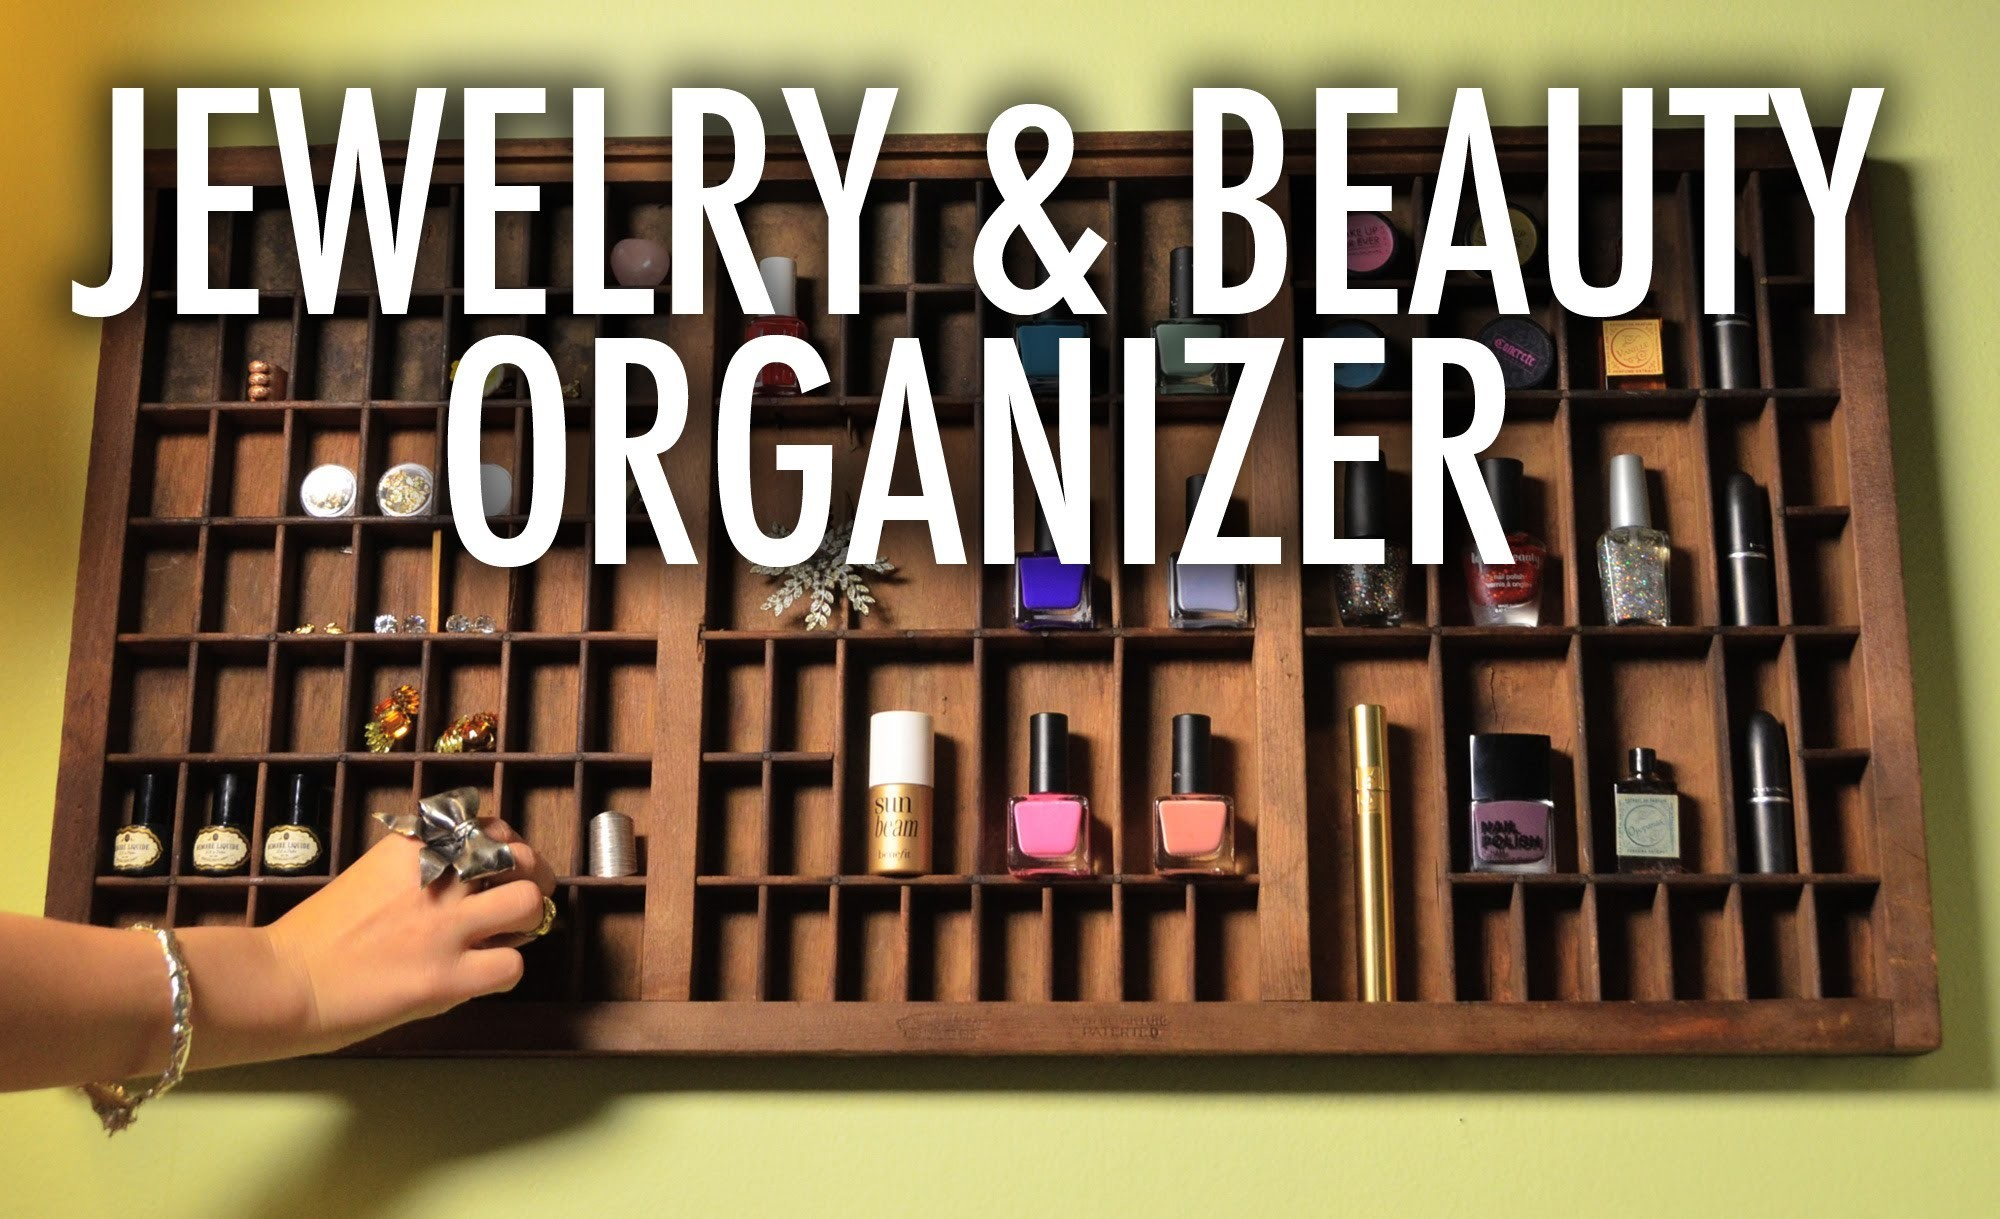 Jewelry and Nail Polish Letterpress Organizer - Mr. Kate Quickie